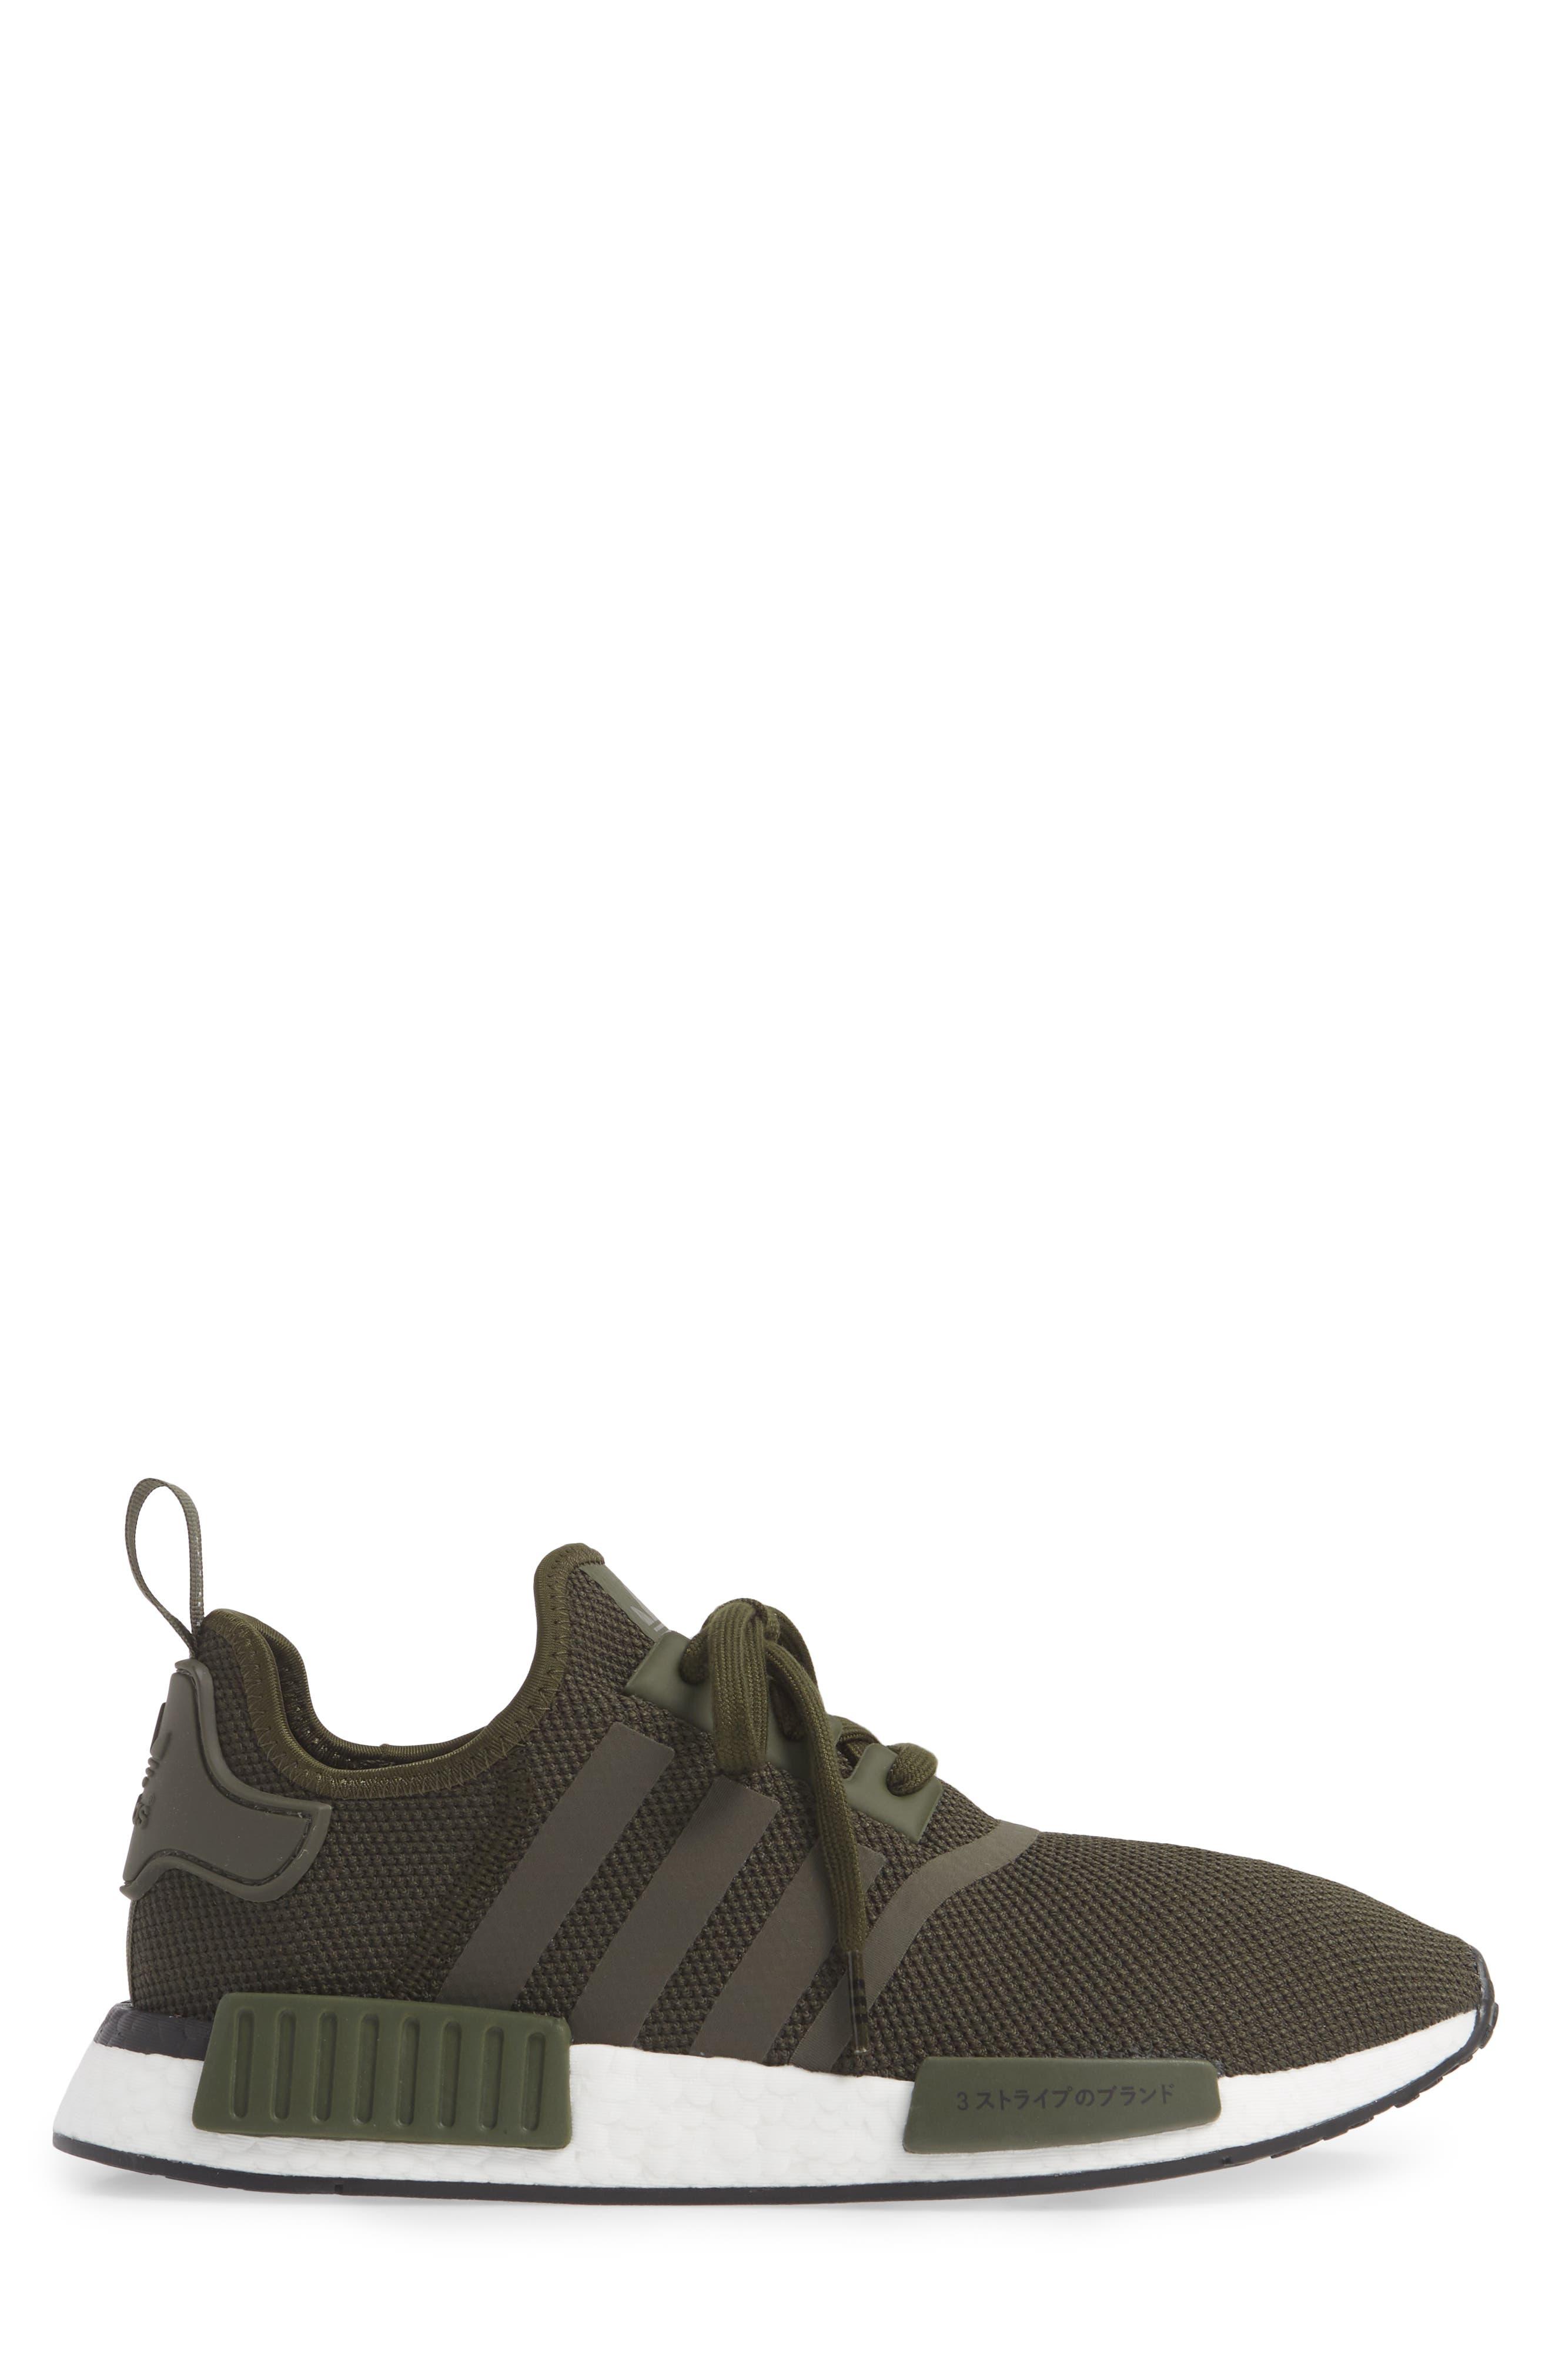 ADIDAS, Originals NMD R1 Sneaker, Alternate thumbnail 3, color, NIGHT CARGO/ BLACK